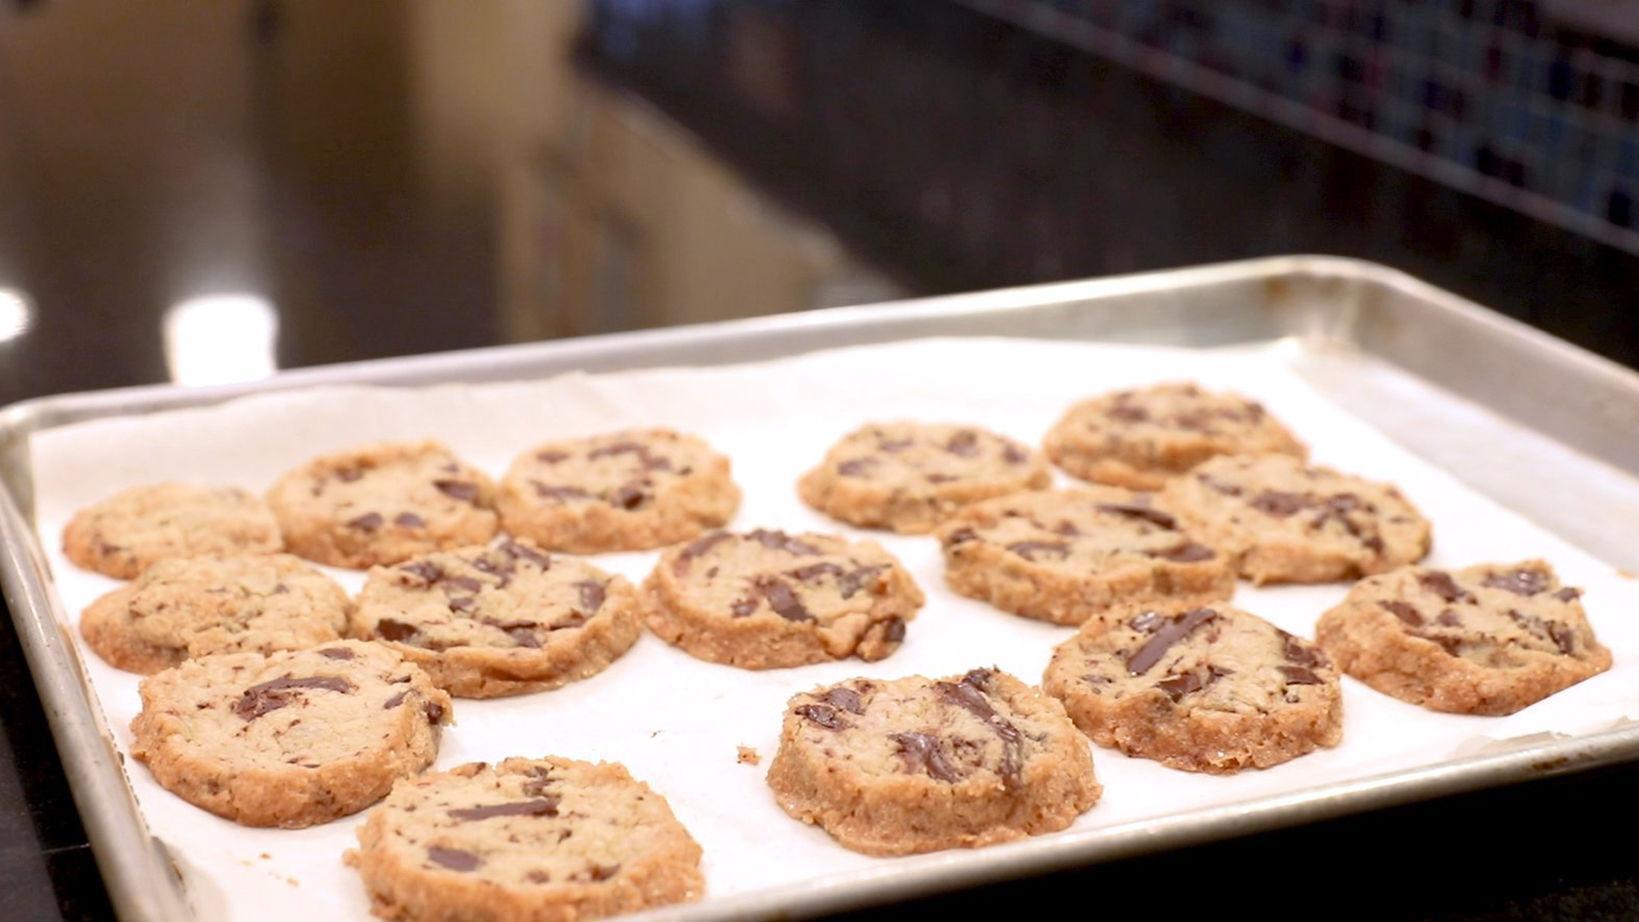 Neman: Comfort me with cookies; the nation responds to the coronavirus